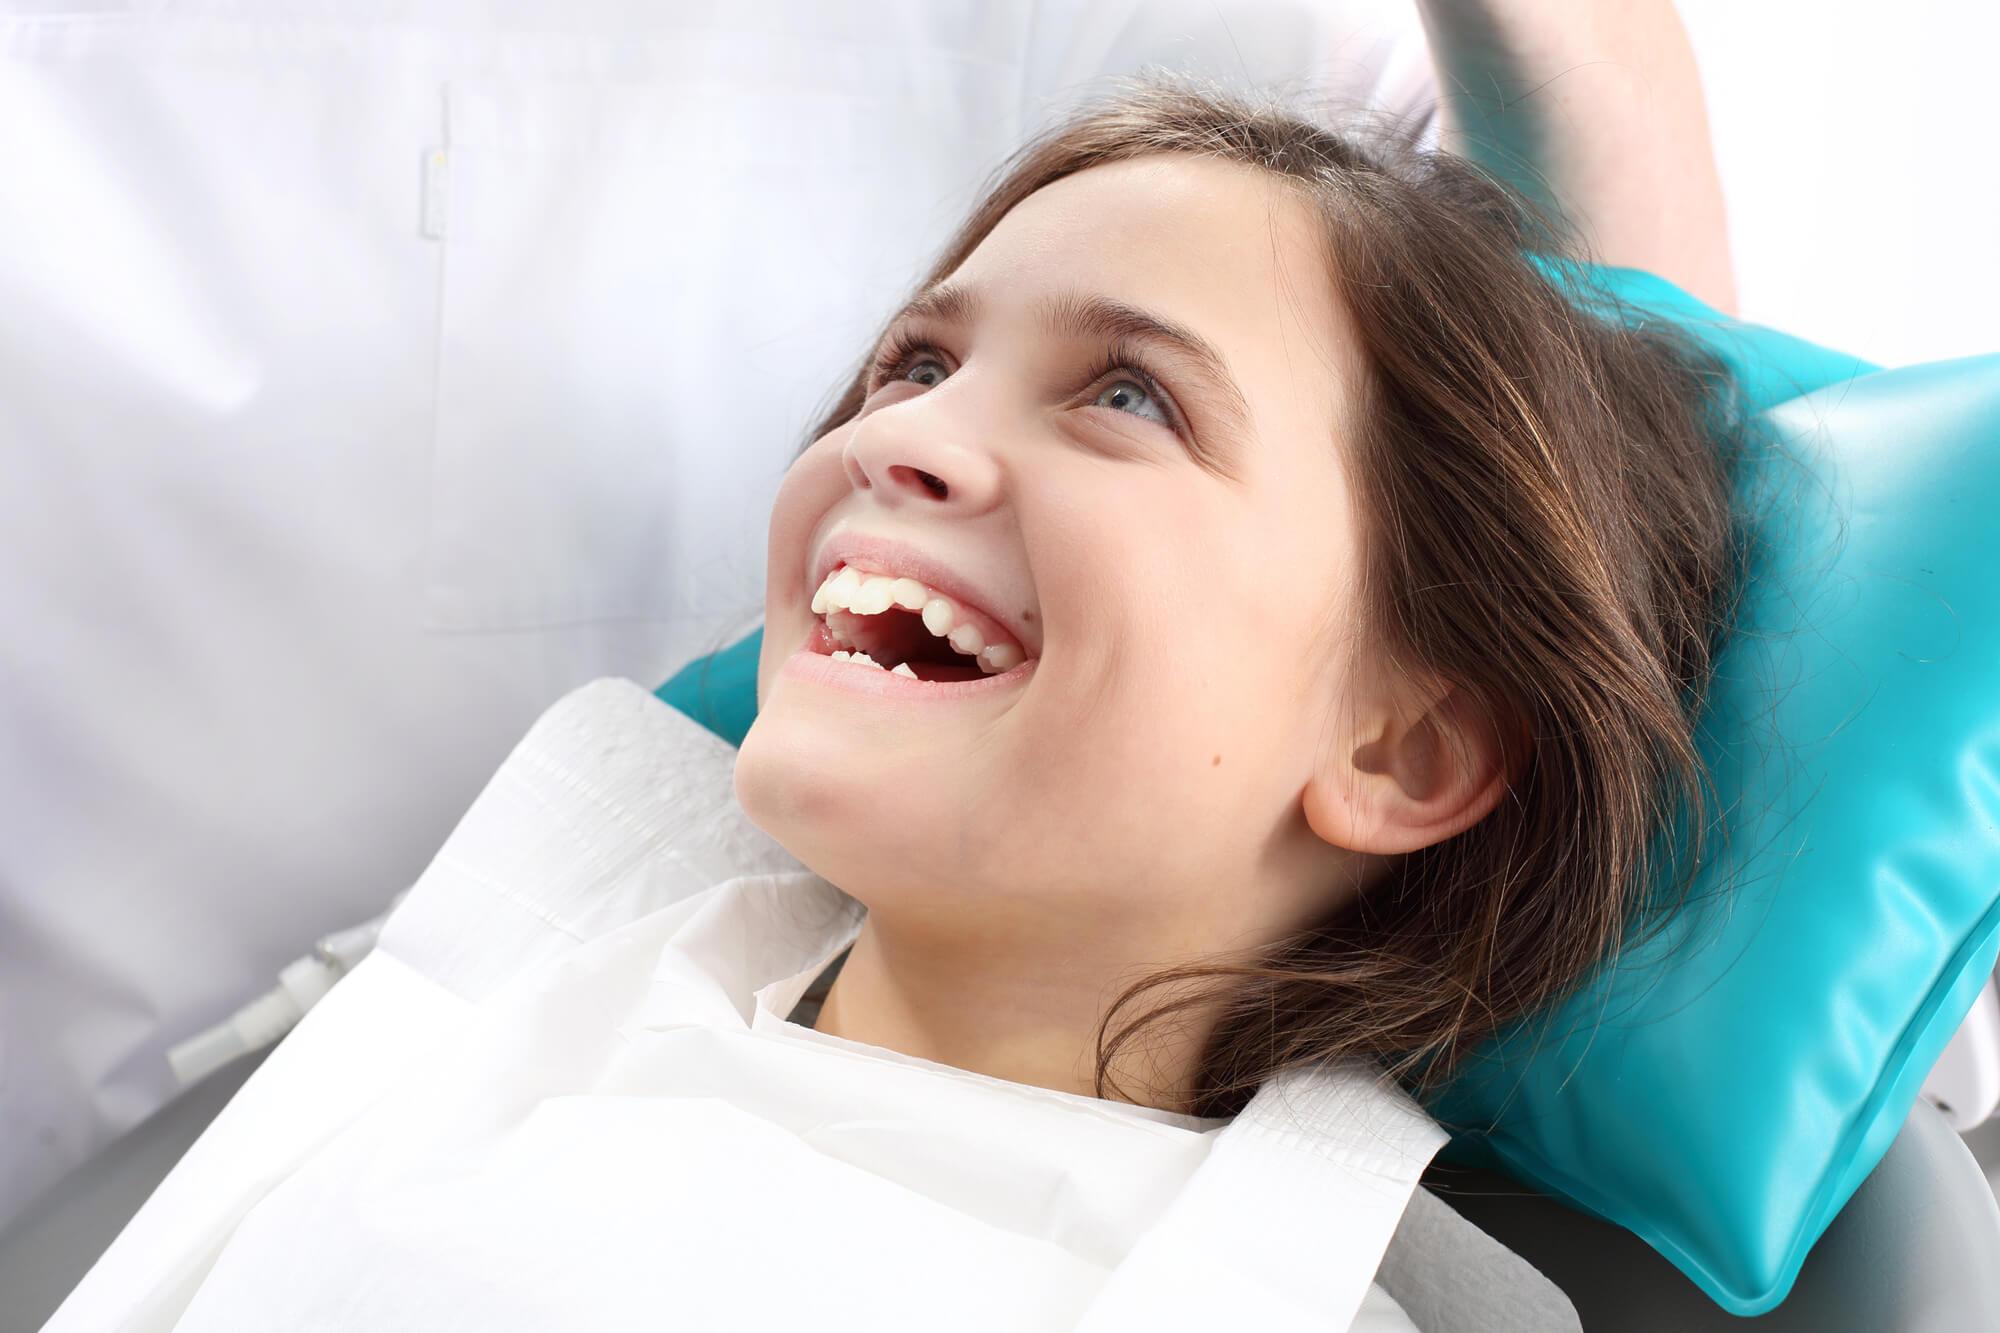 where can I find dental sealants in boynton beach